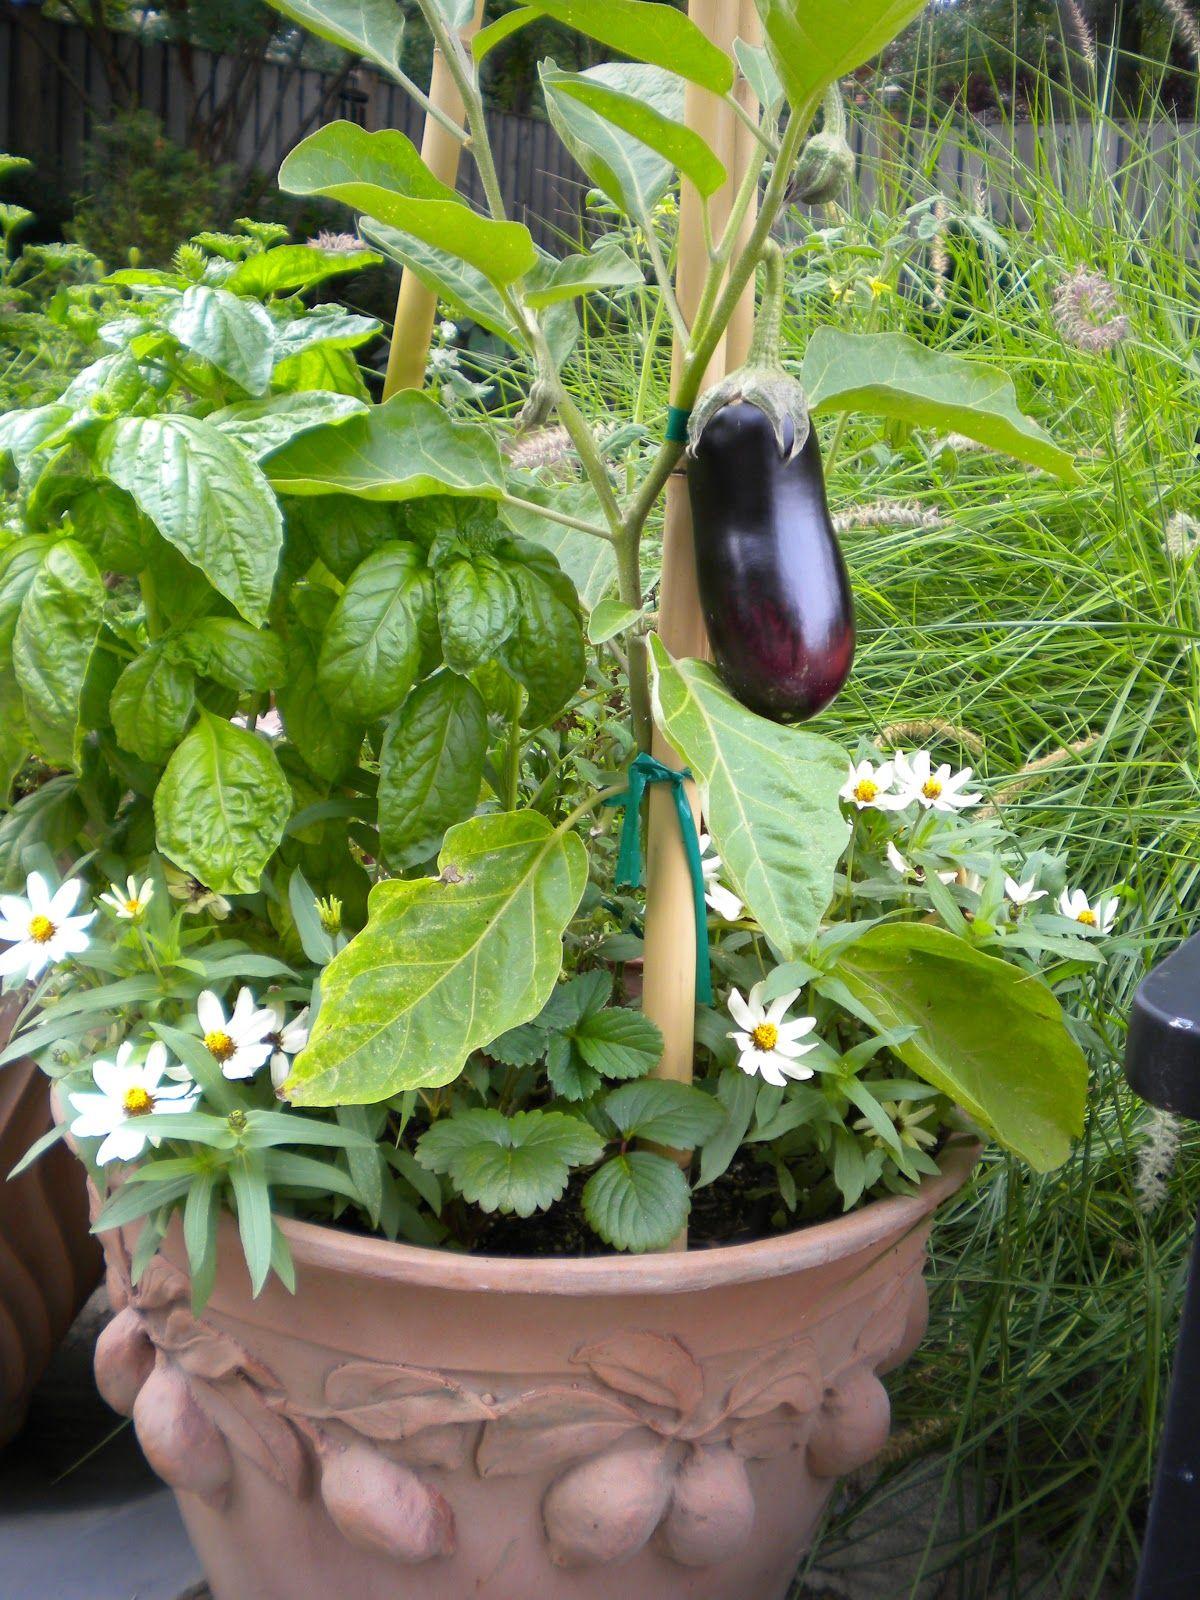 vegetable garden fence ideas click image to review more - Kitchen Garden Ideas